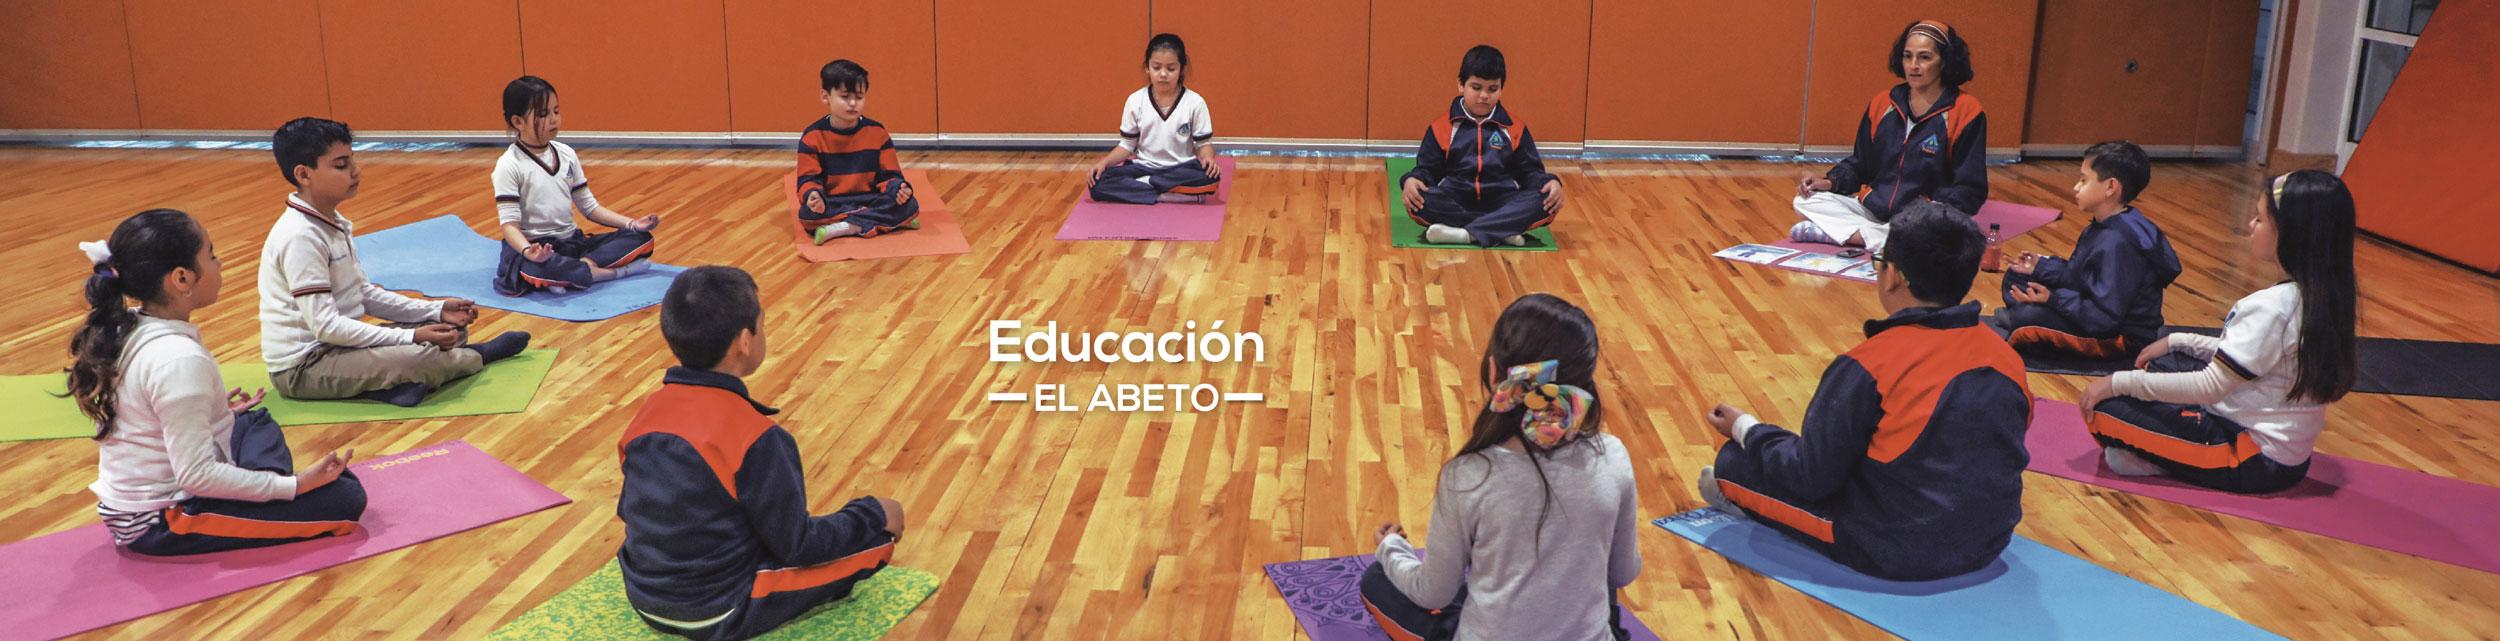 banner-arriba-02